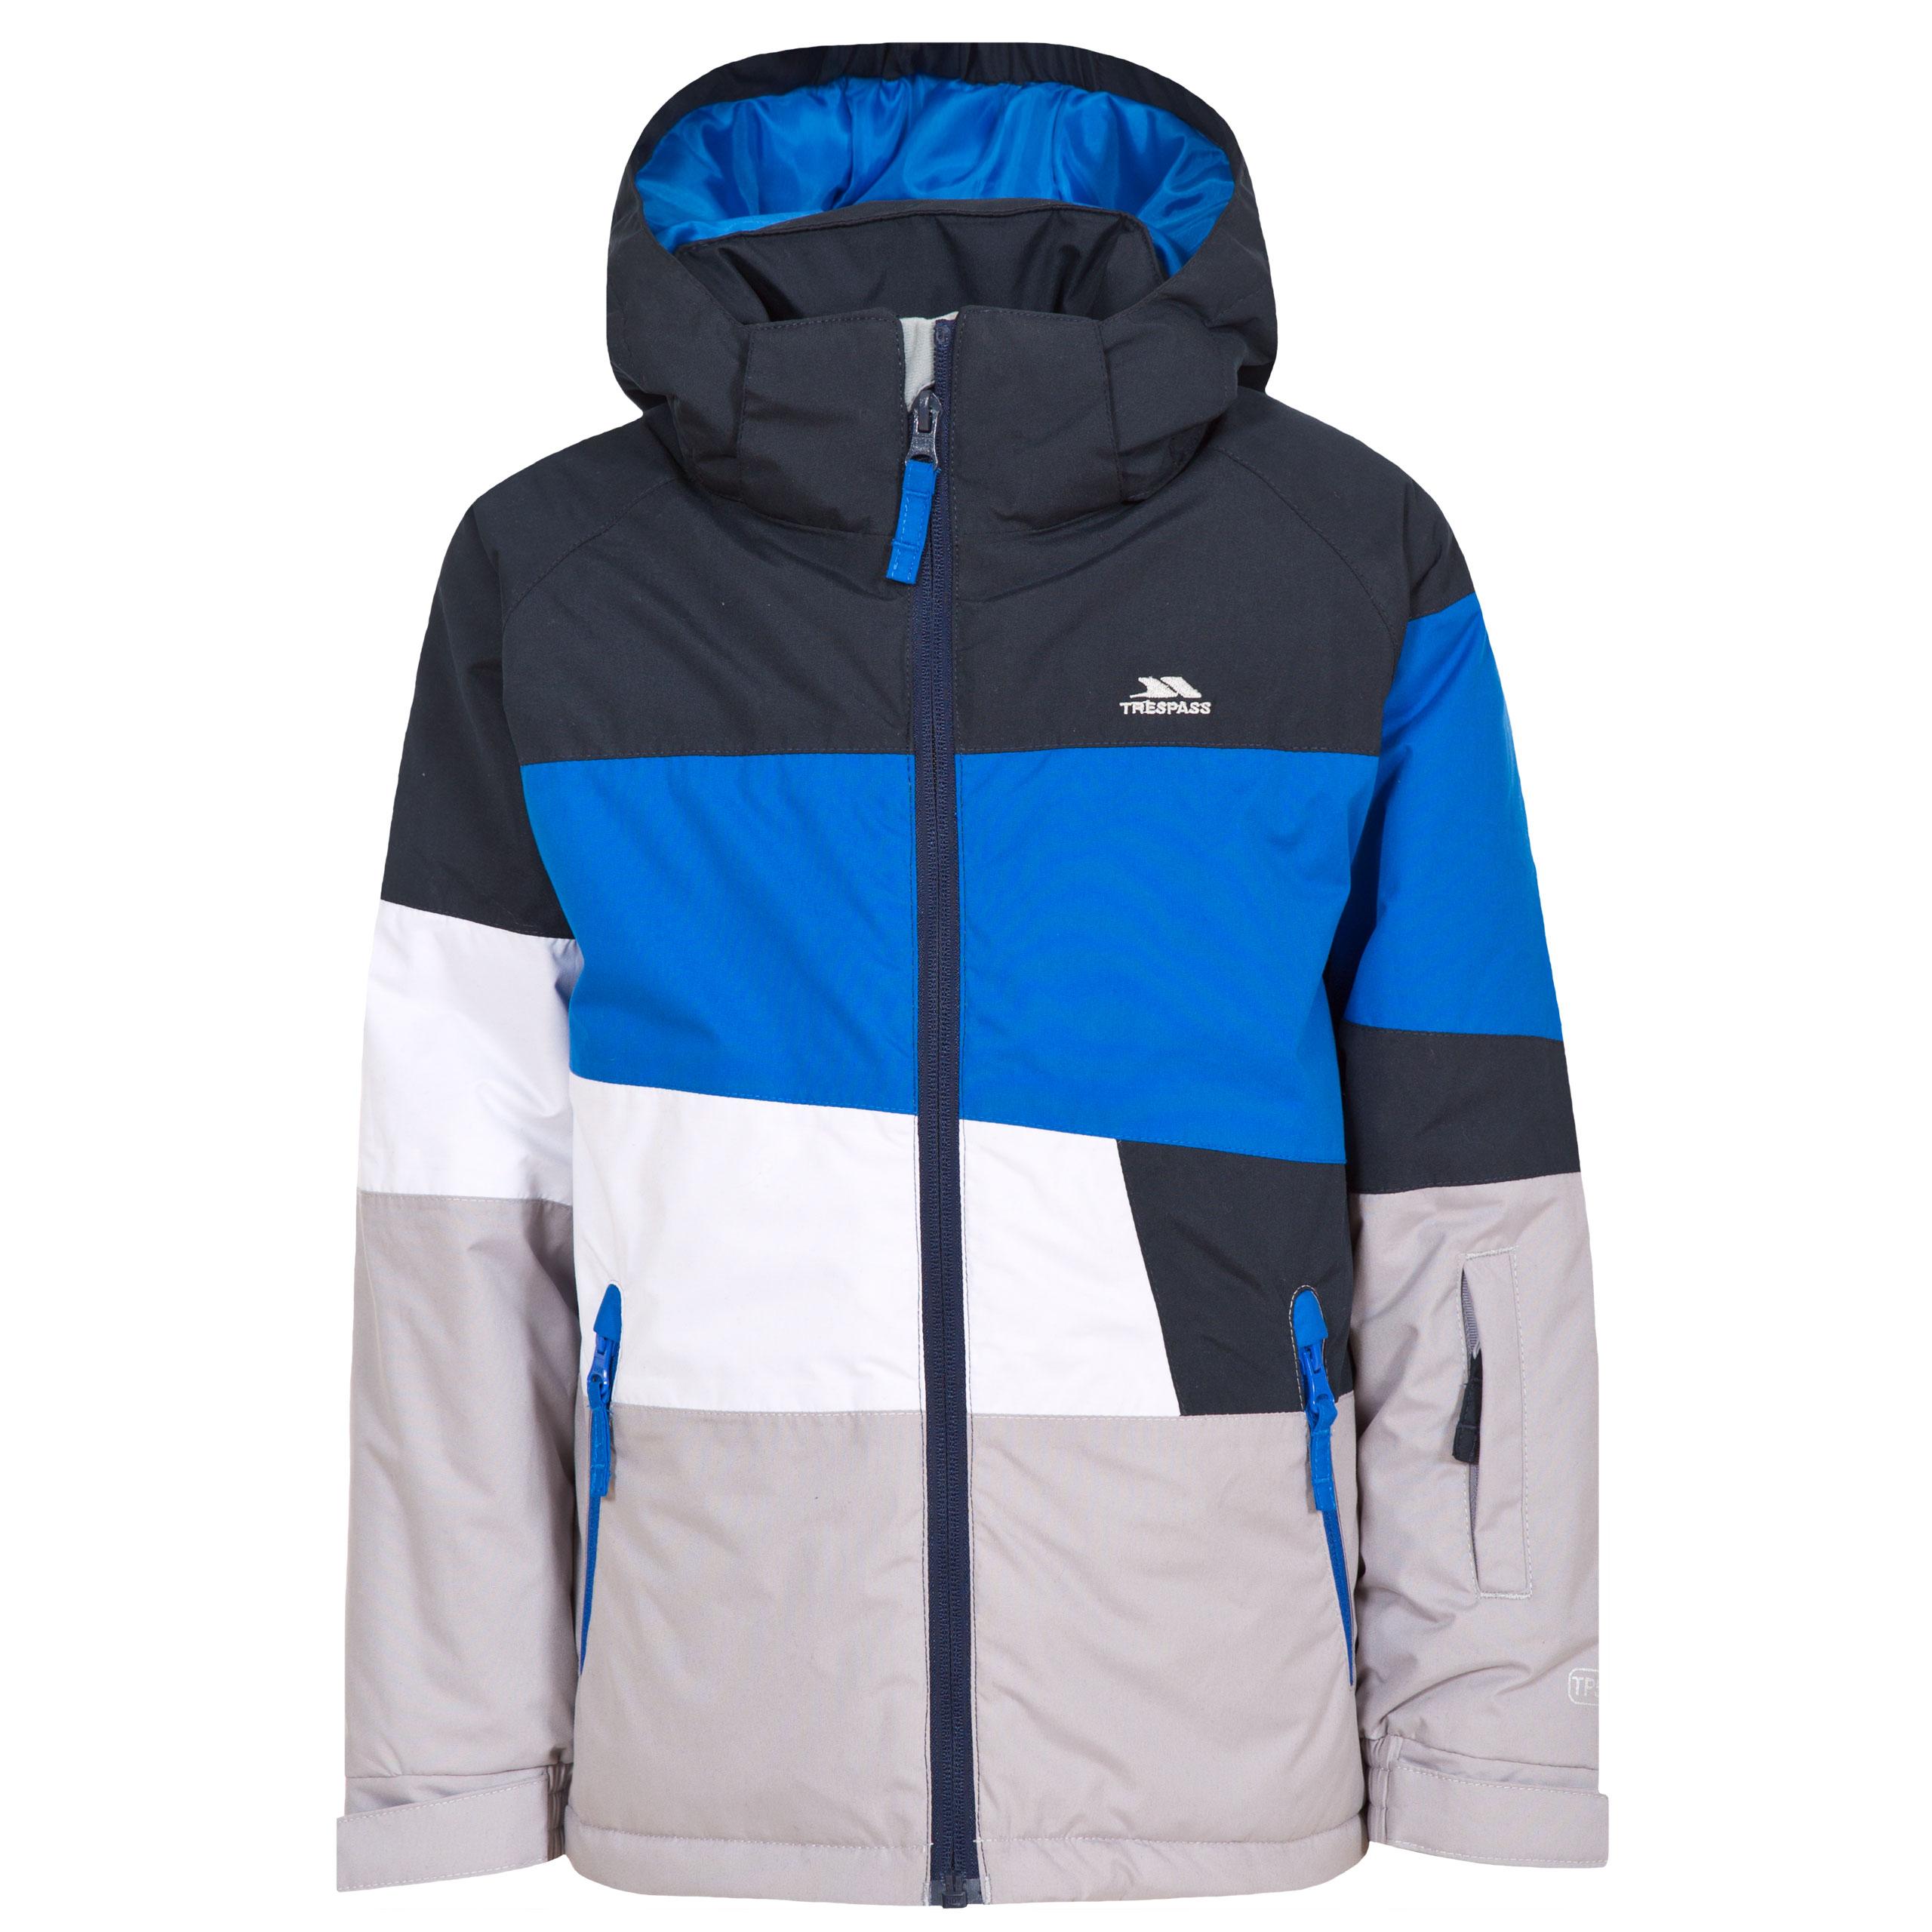 trespass sedley boys ski waterproof jacket winter insulated hooded #1: sedley mcjkskm blu a 1